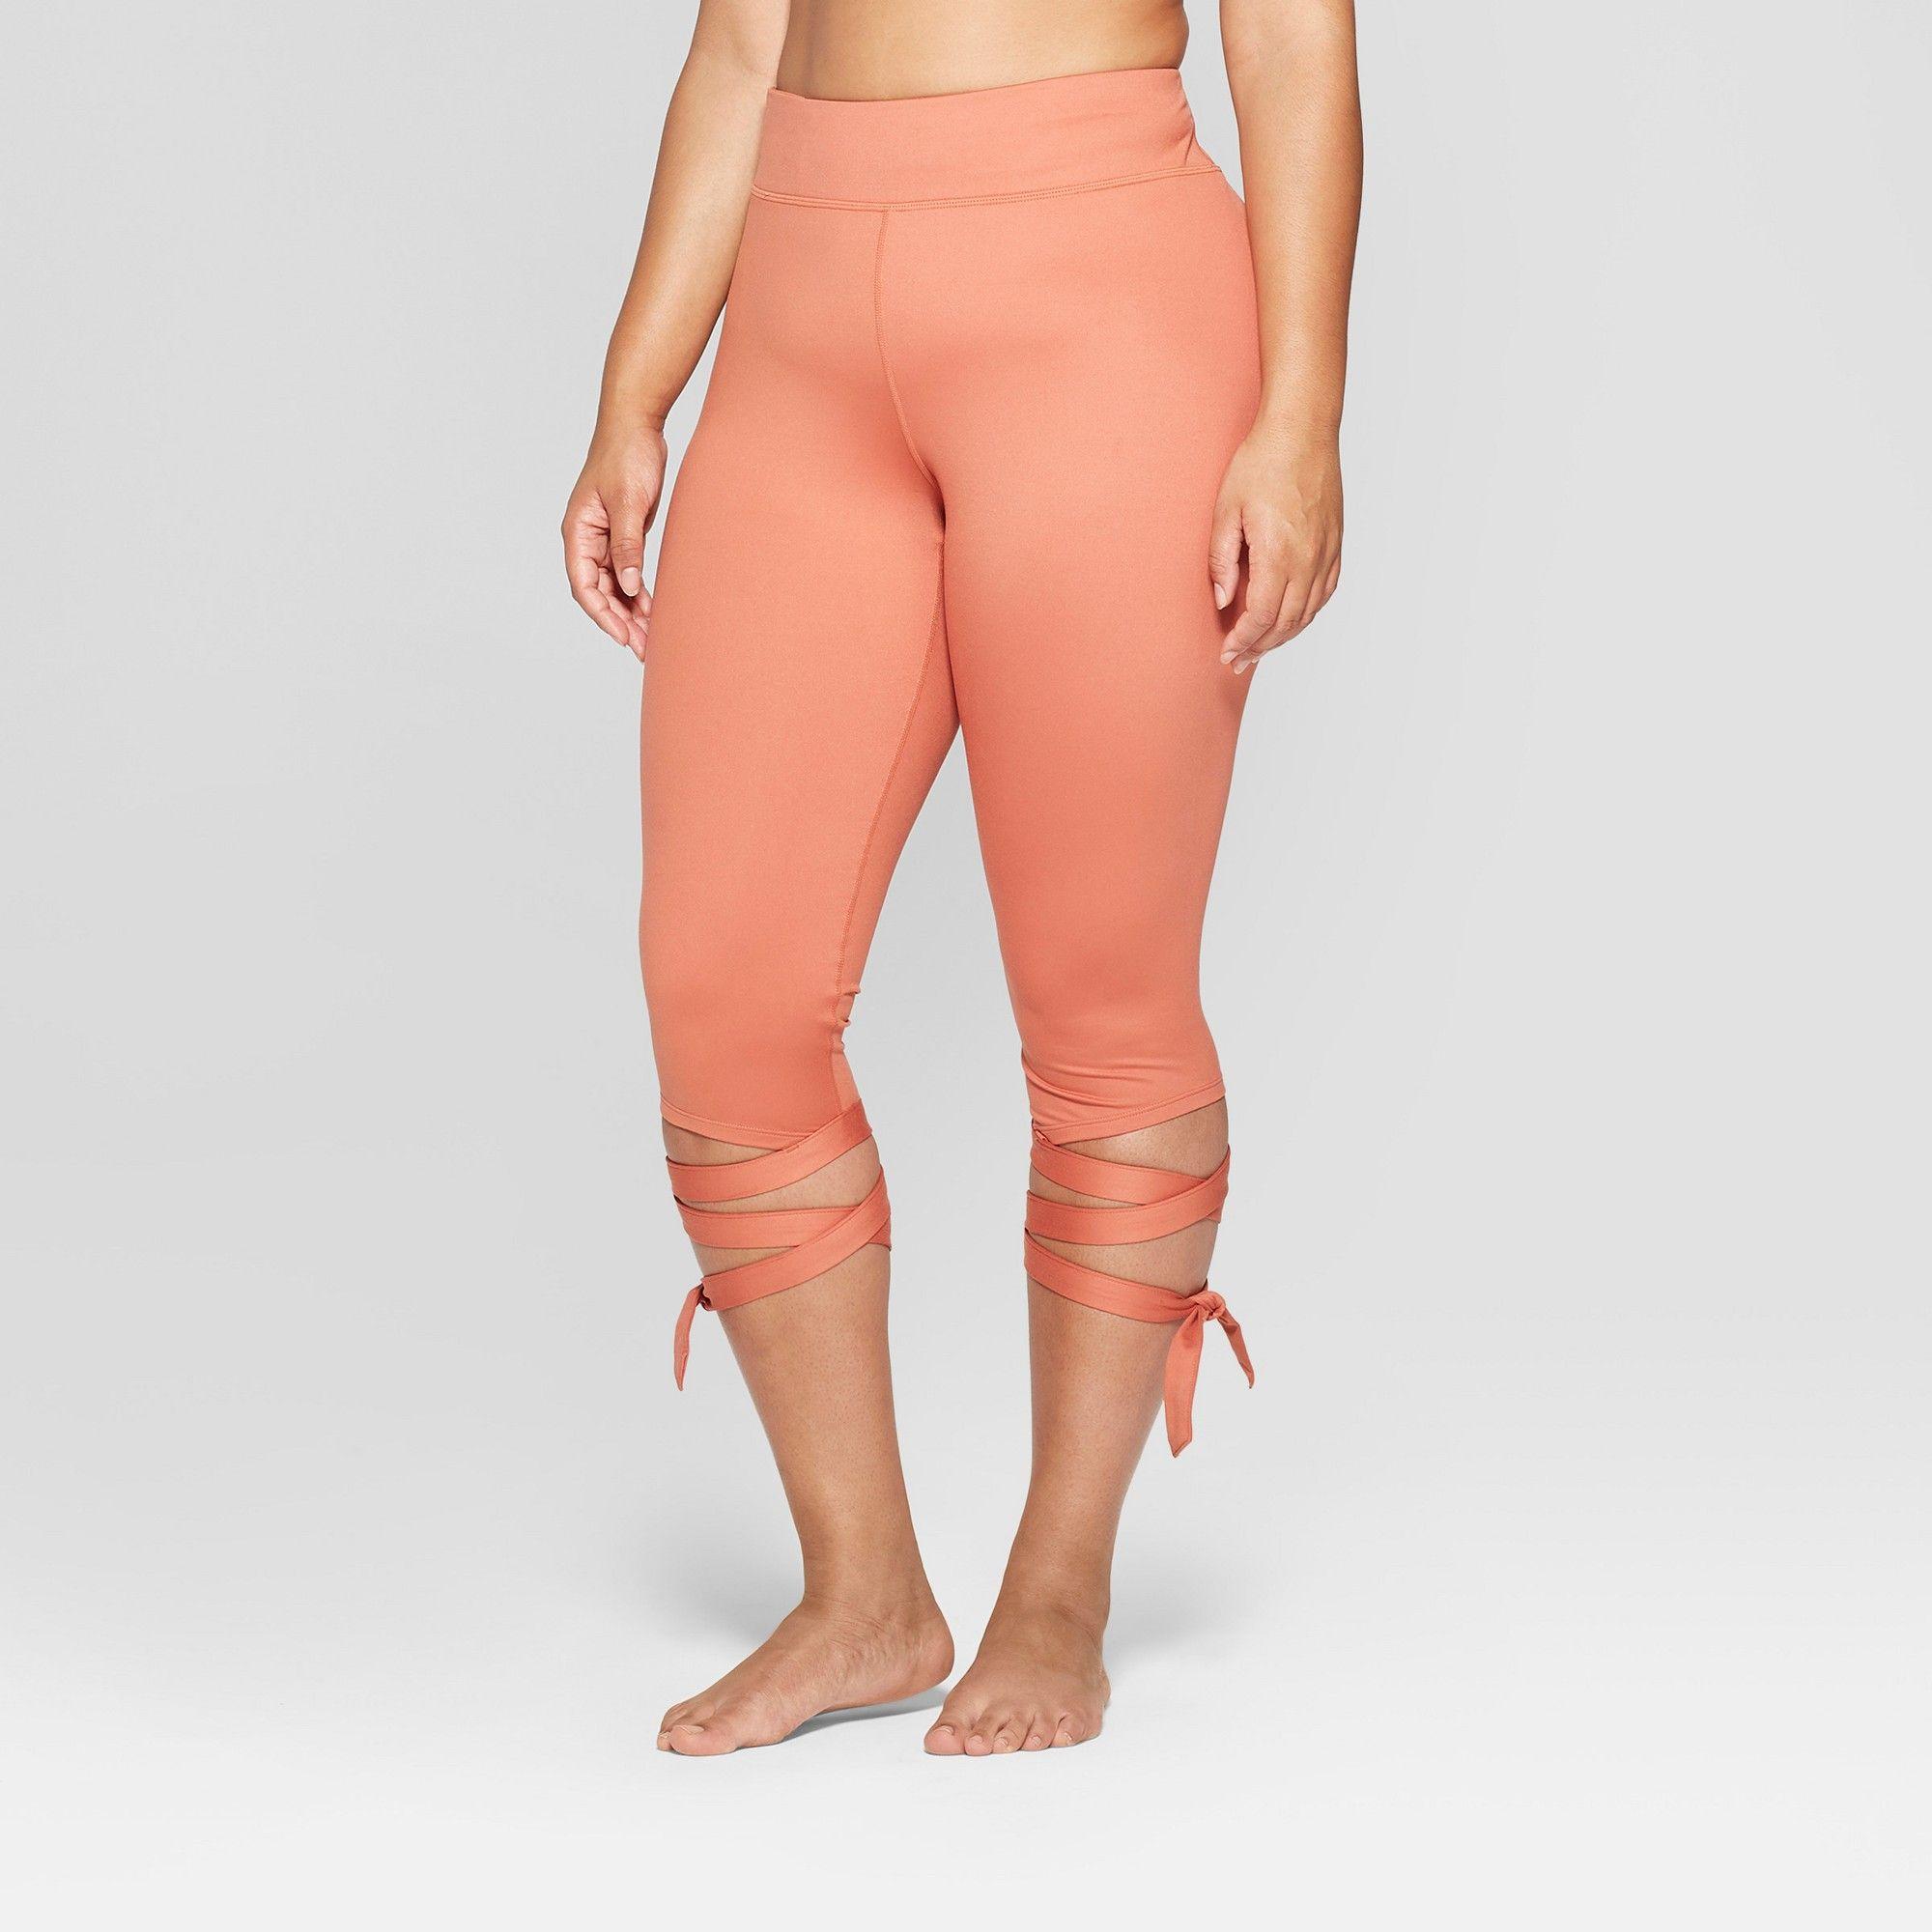 Women's Plus Size Side Tie MidRise Capri Leggings